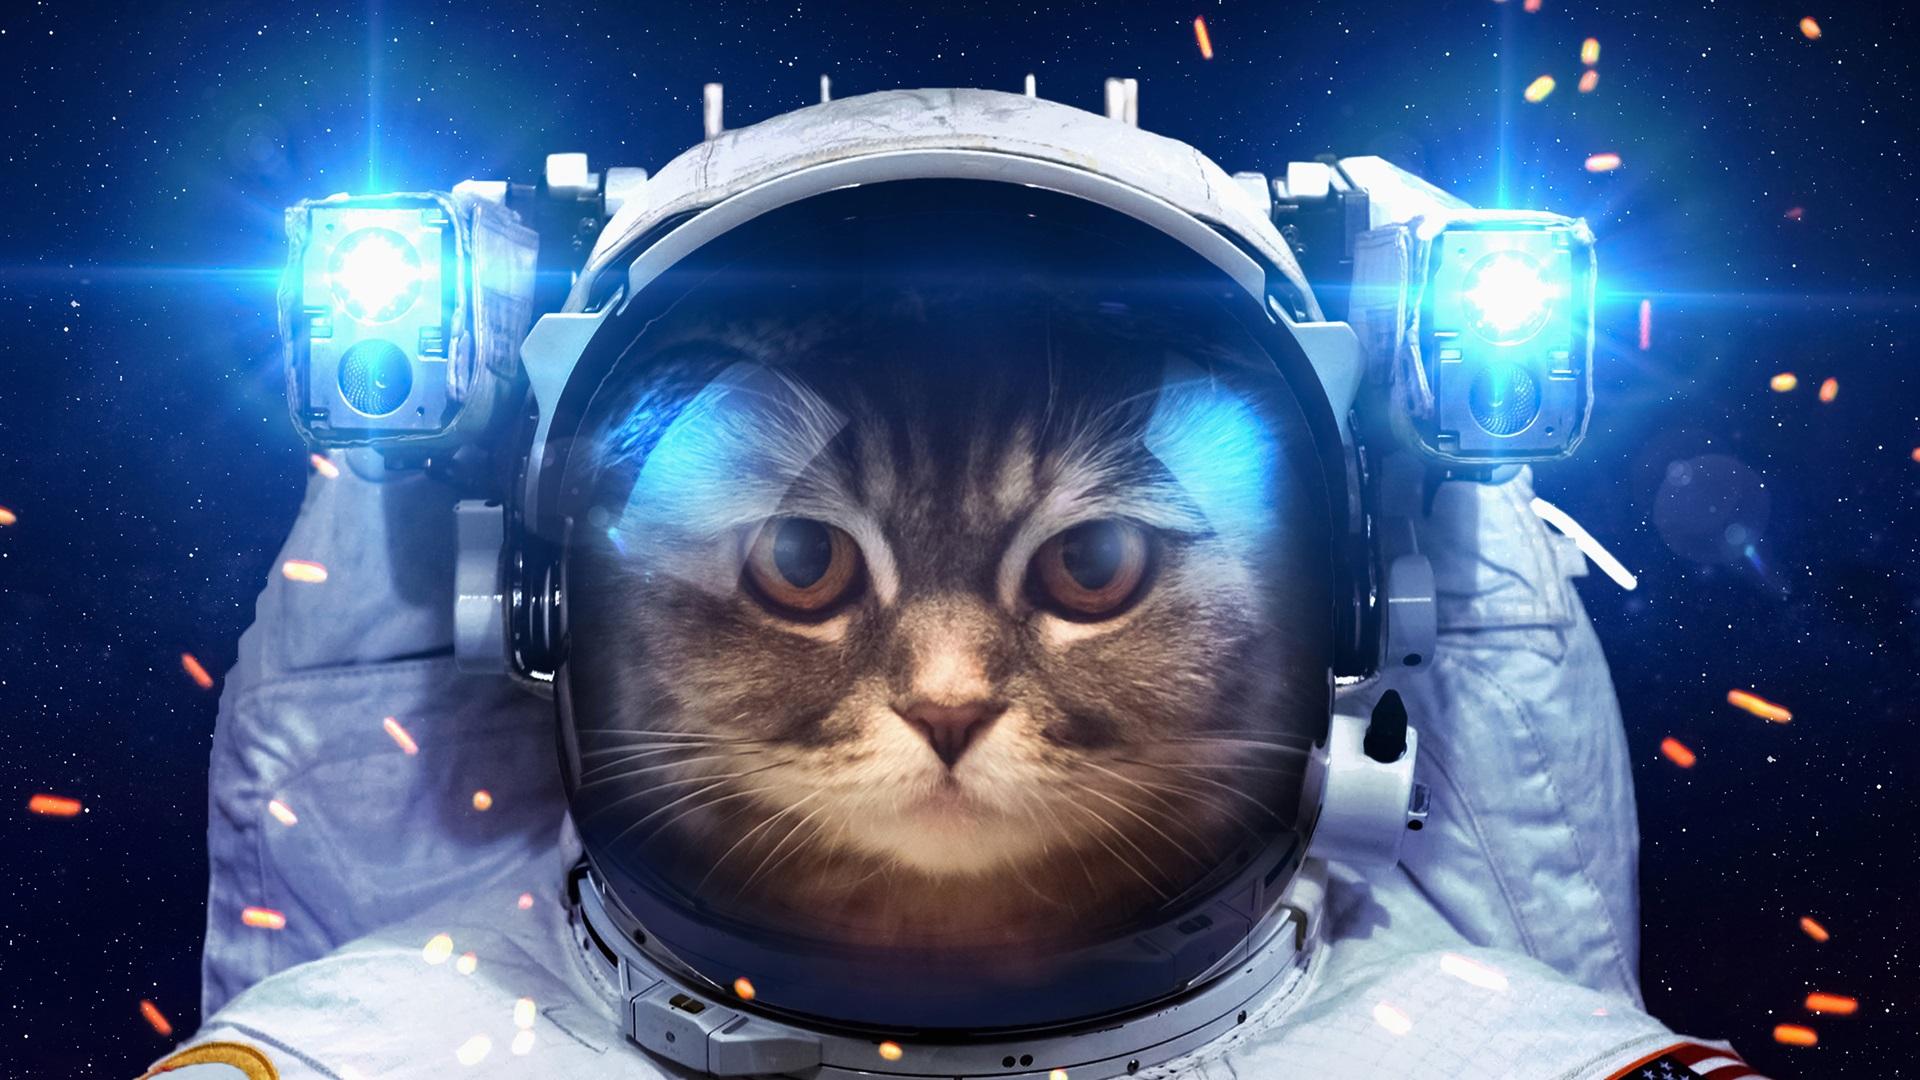 Humor Cat As A Astronaut Space Light Wallpaper